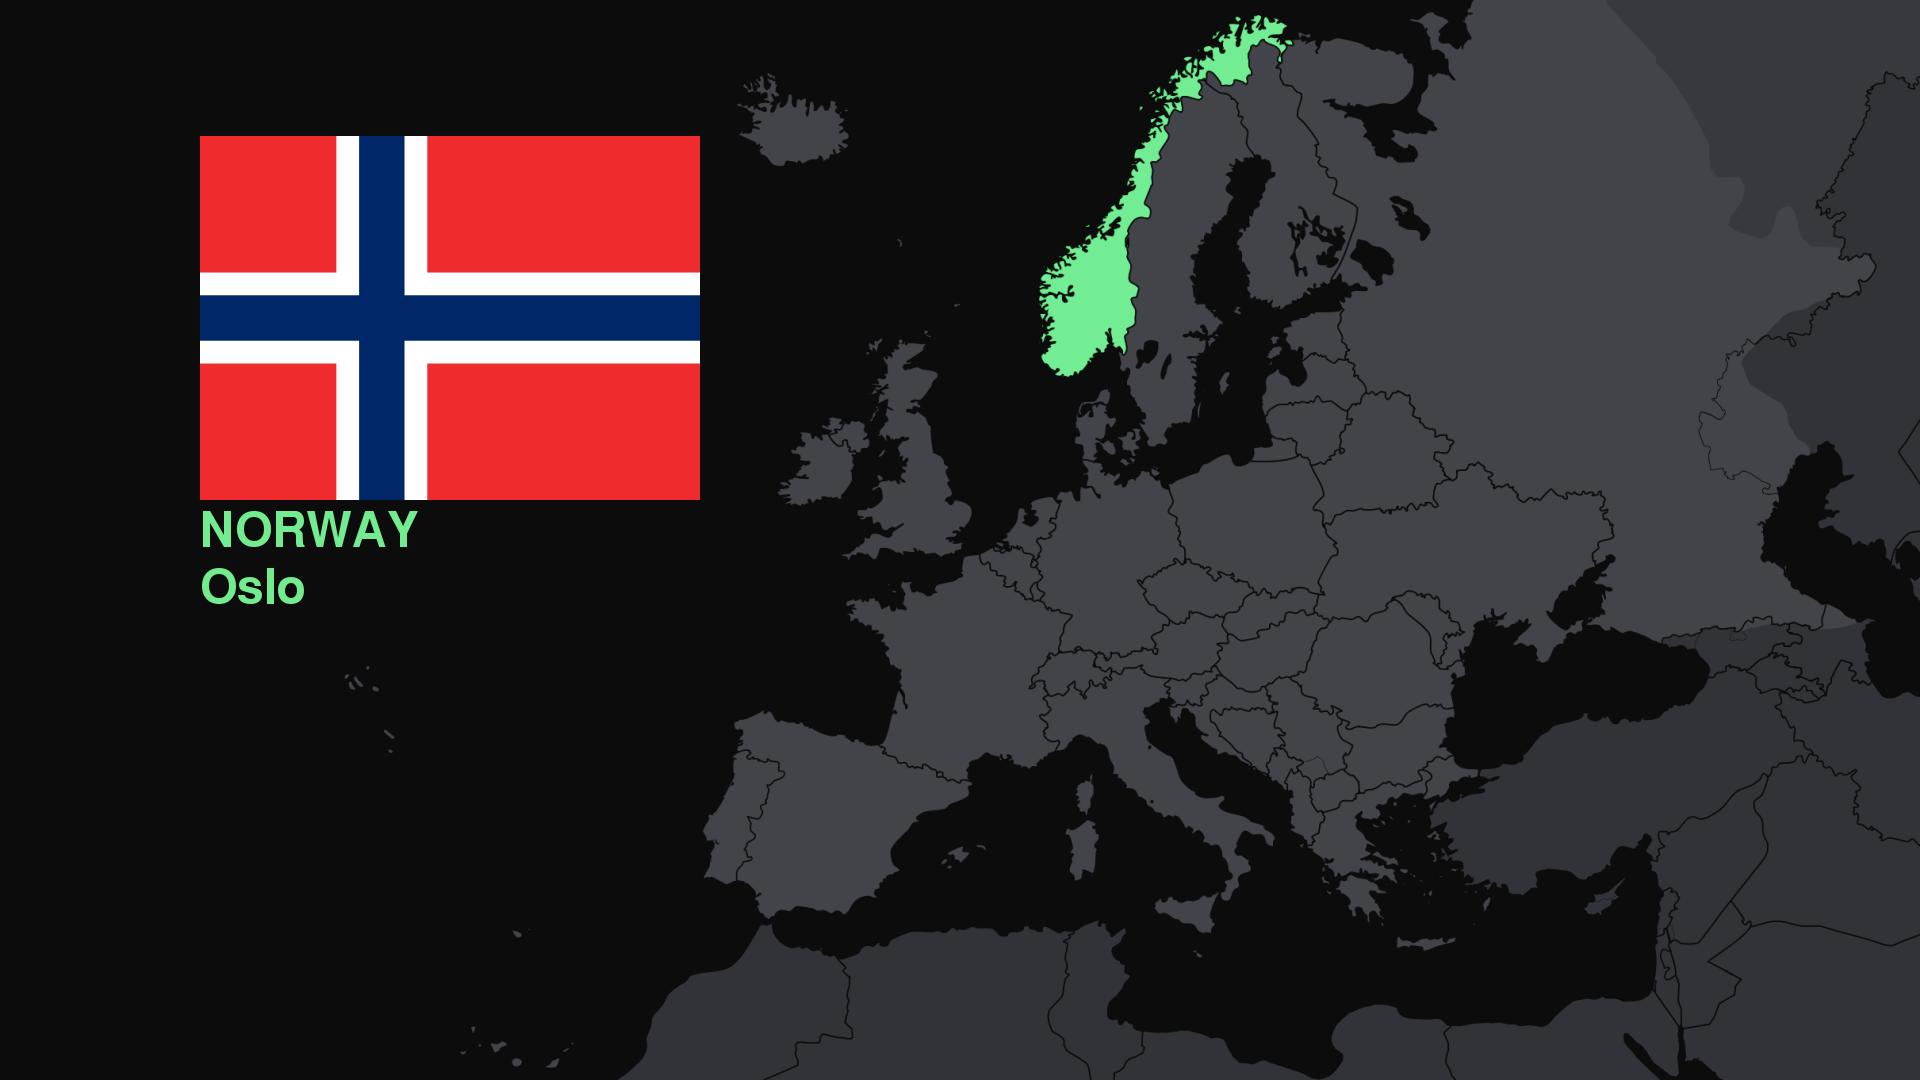 Wallpaper illustration norway flag world map europe illustration norway flag world map europe screenshot font gumiabroncs Choice Image